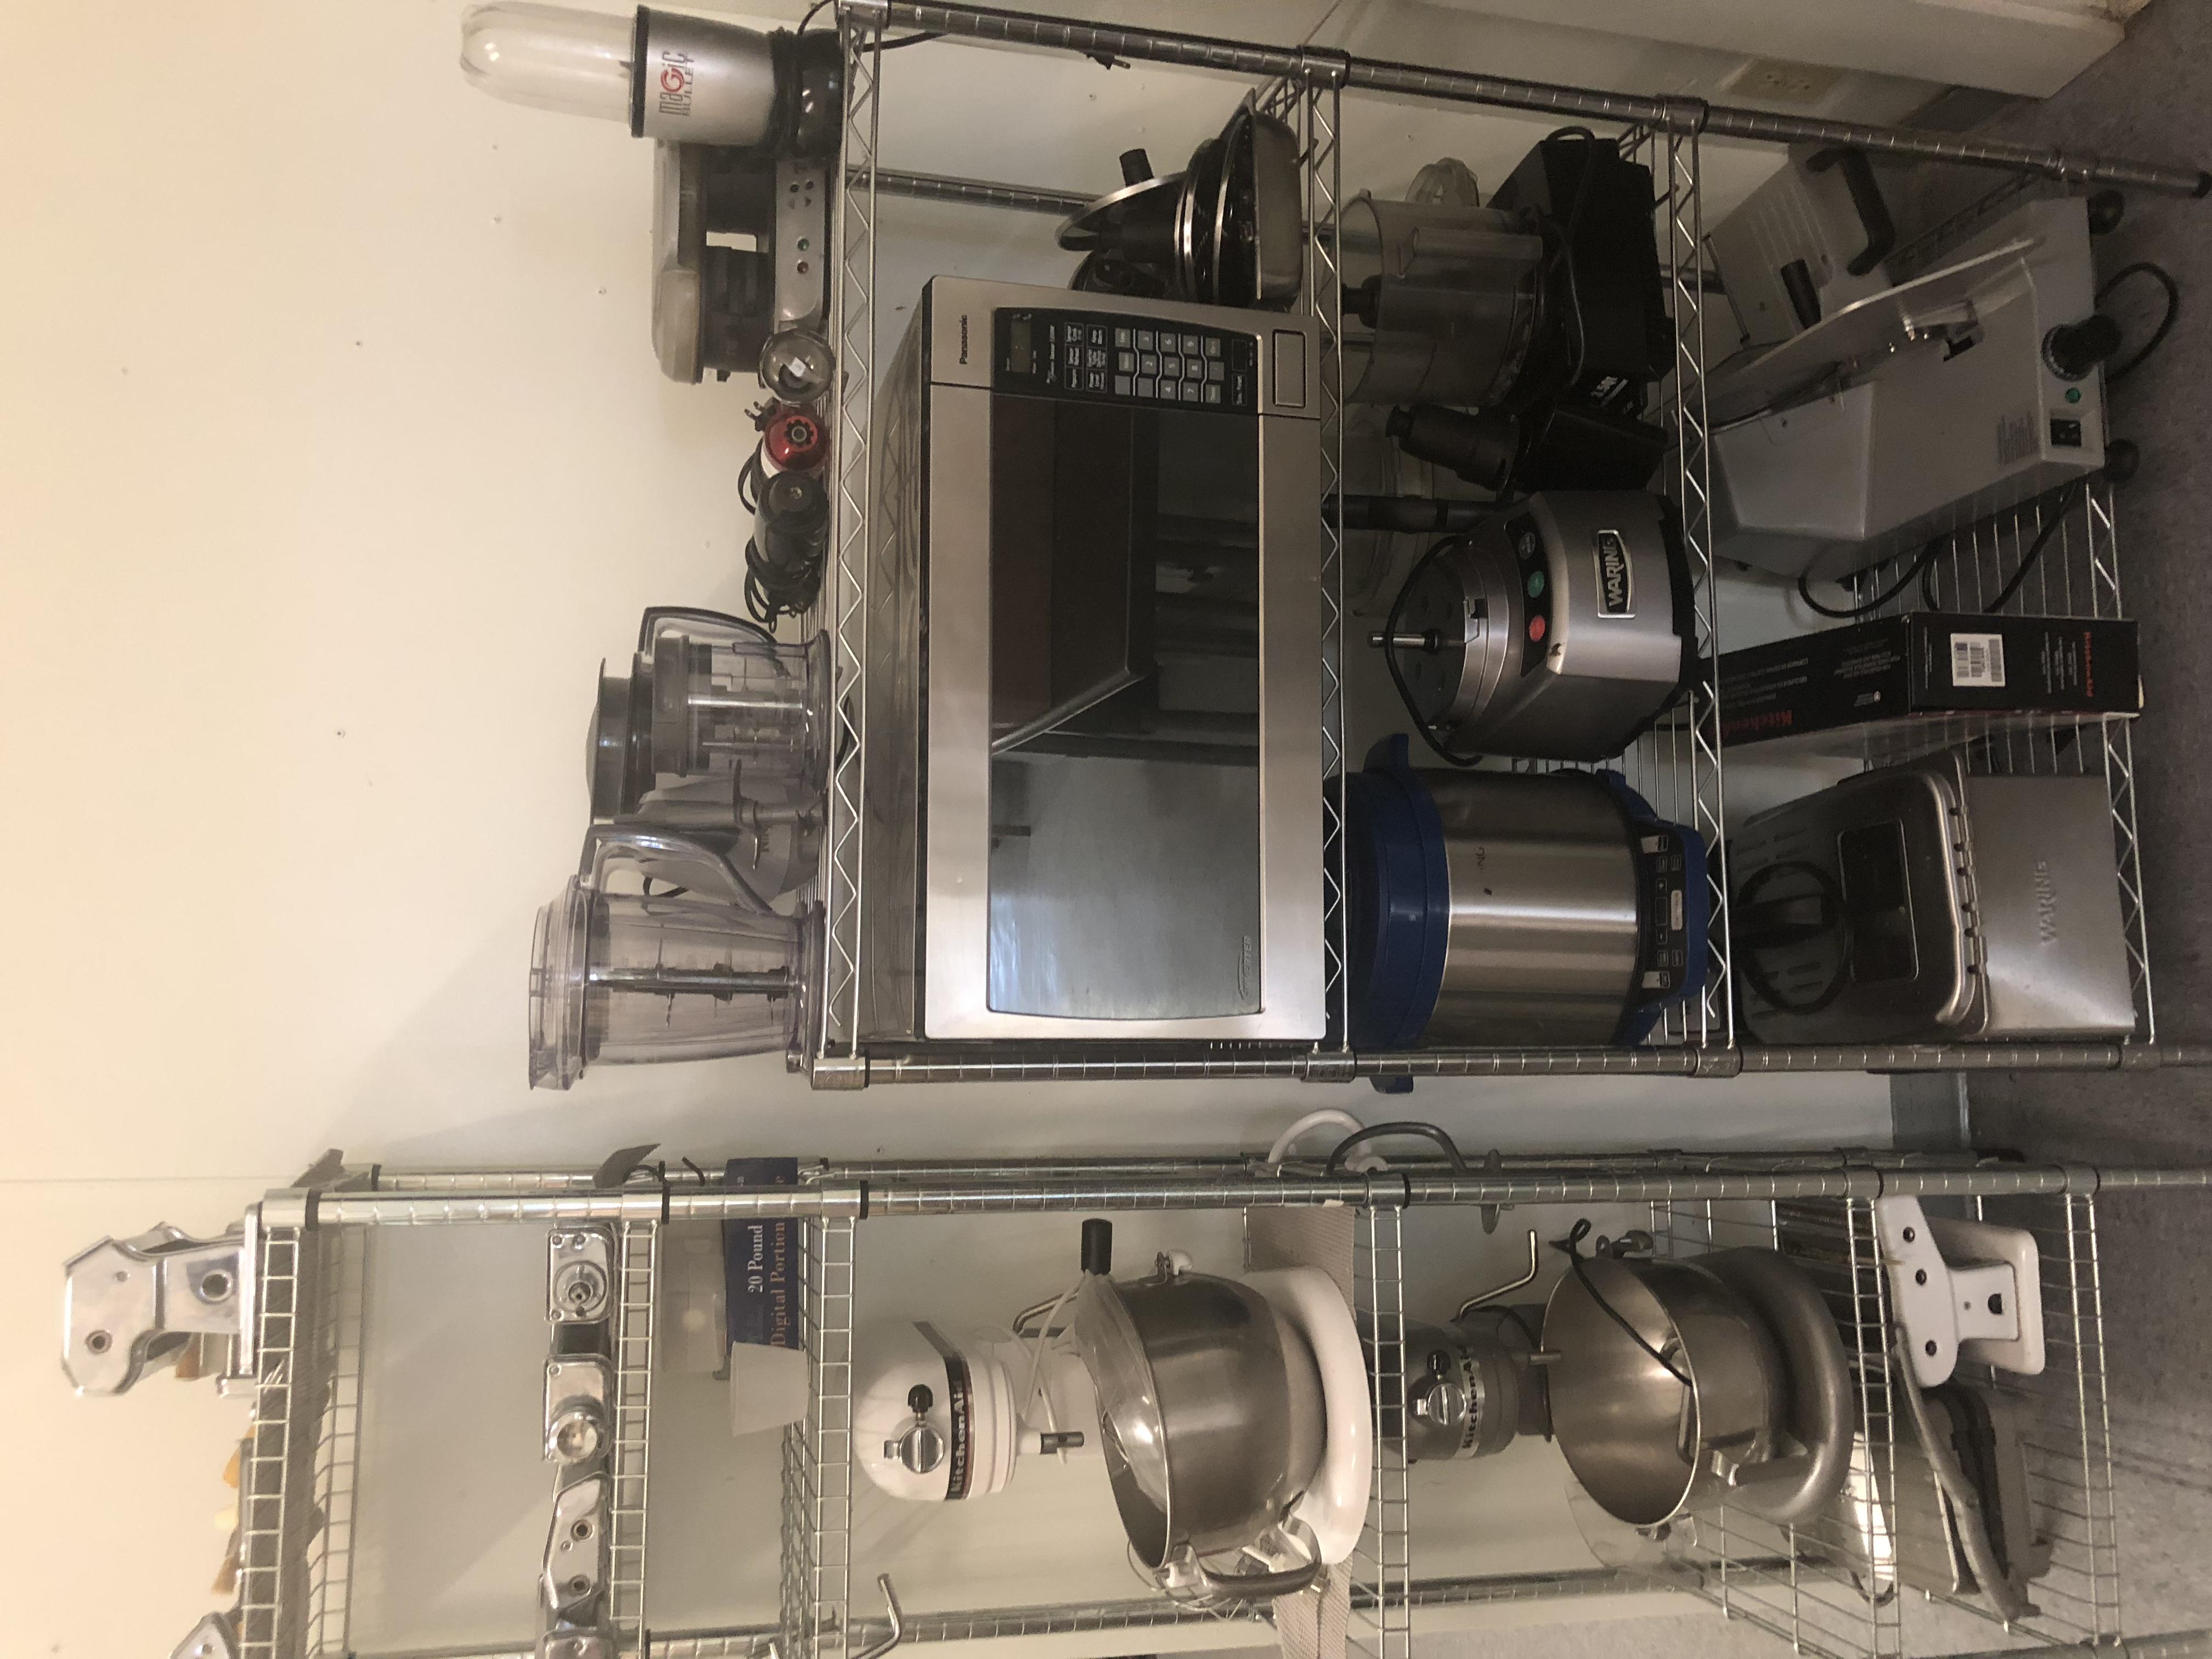 Additional small equipment